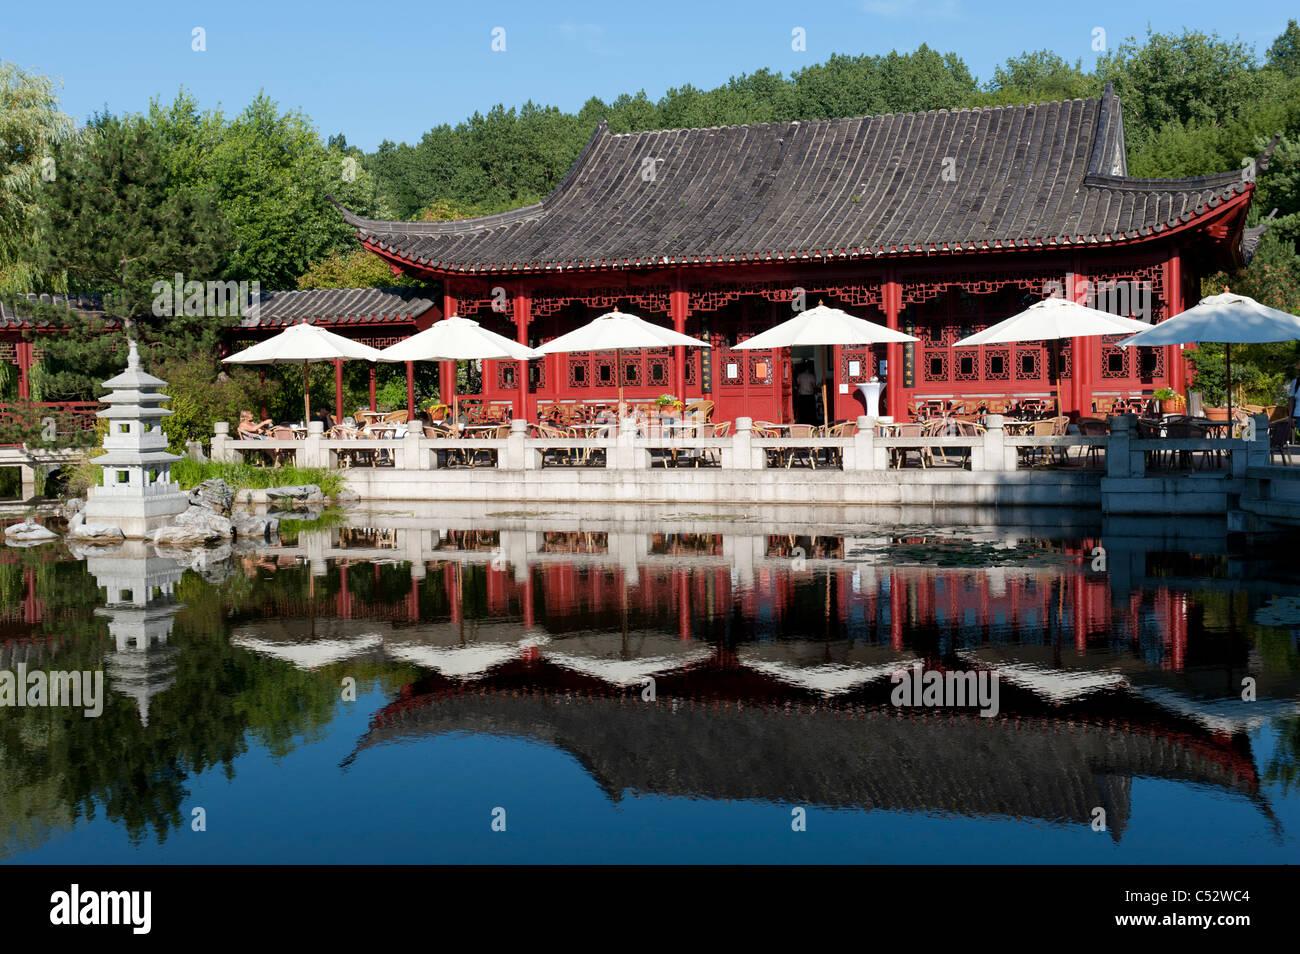 The Chinese Garden at the Garten der Welt in Marzahn district of Berlin Germany - Stock Image